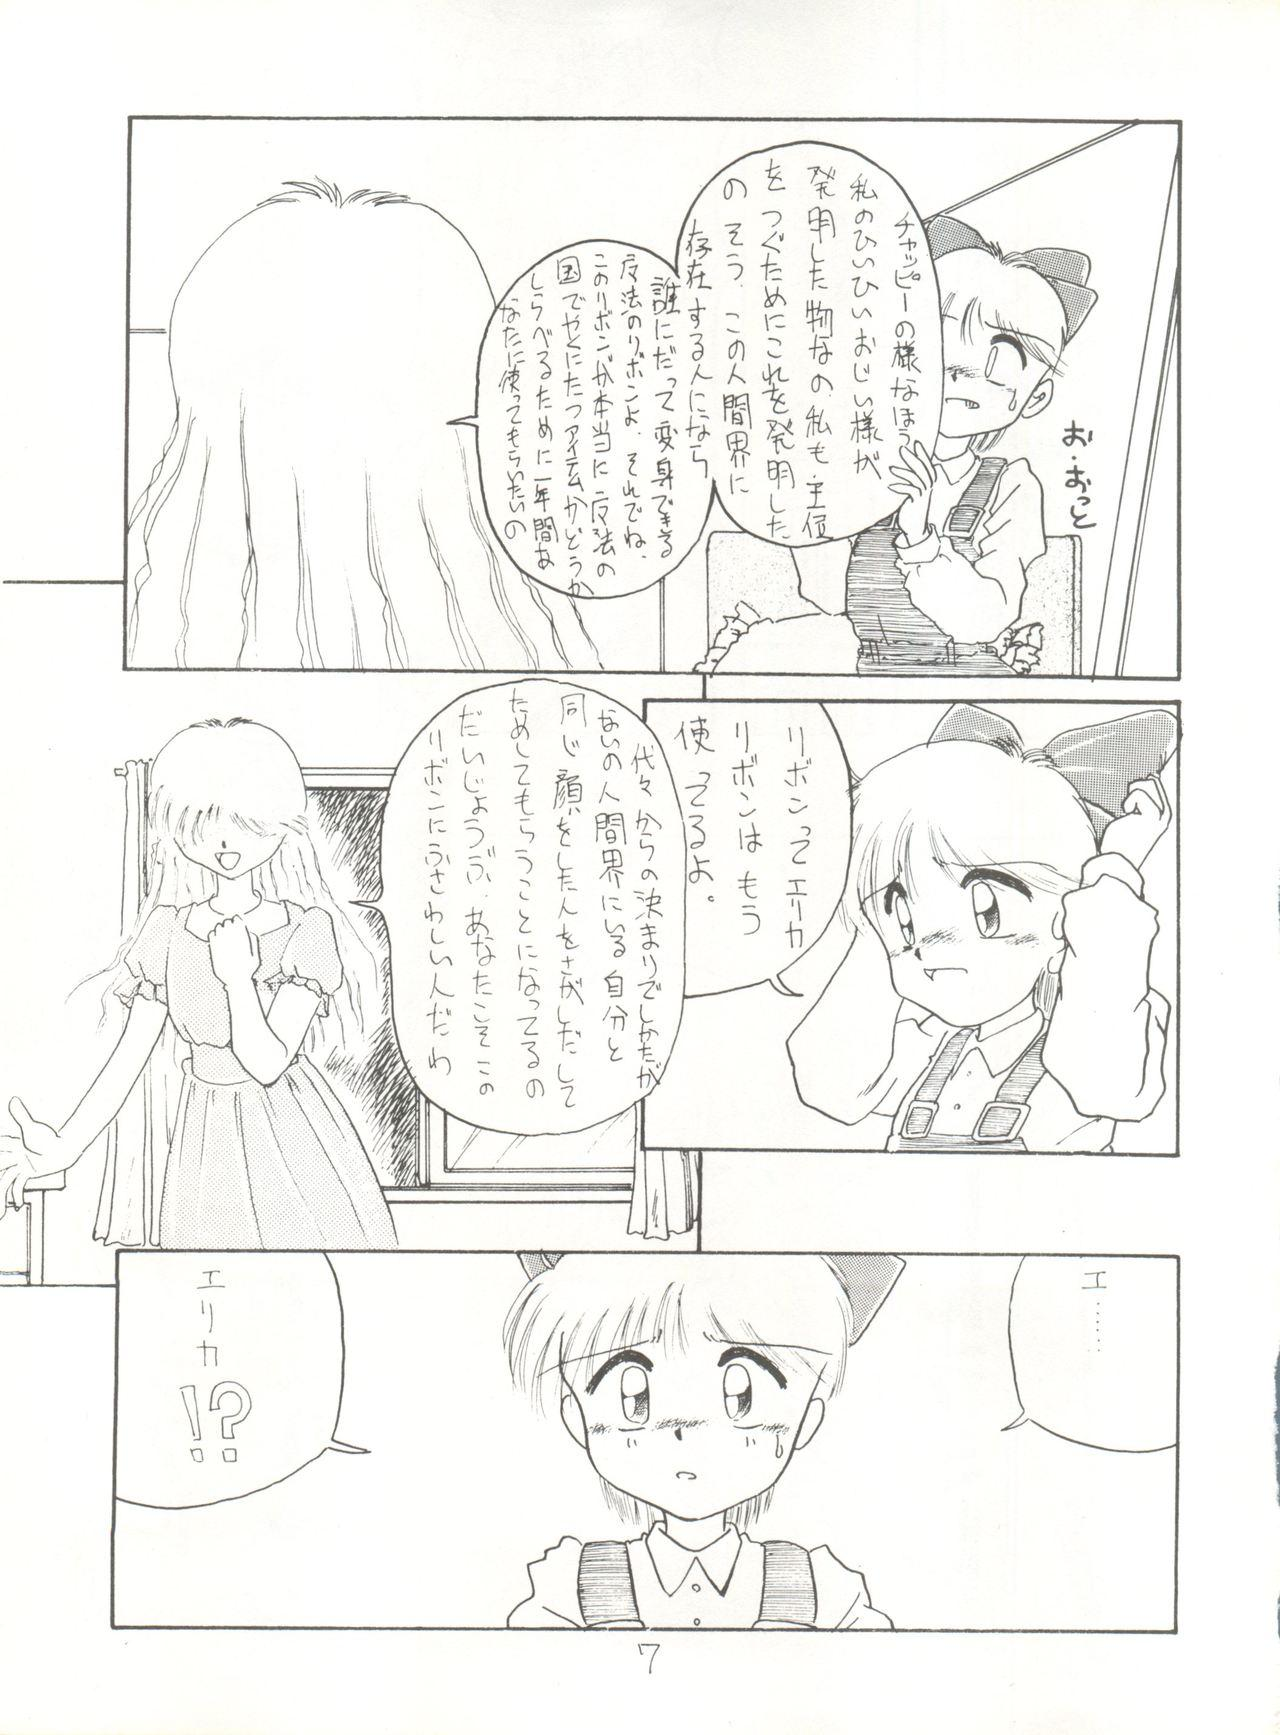 [Global One (MARO)] Sadistic 5 (Cutey Honey, Devilman, Sailor Moon), [Global One (MARO)] Sadistic (Dirty Pair, Fushigi no Umi no Nadia, Sailor Moon), [Studio Ikkatsumajin] .ribbon (Hime-chan's Ribbon) 130